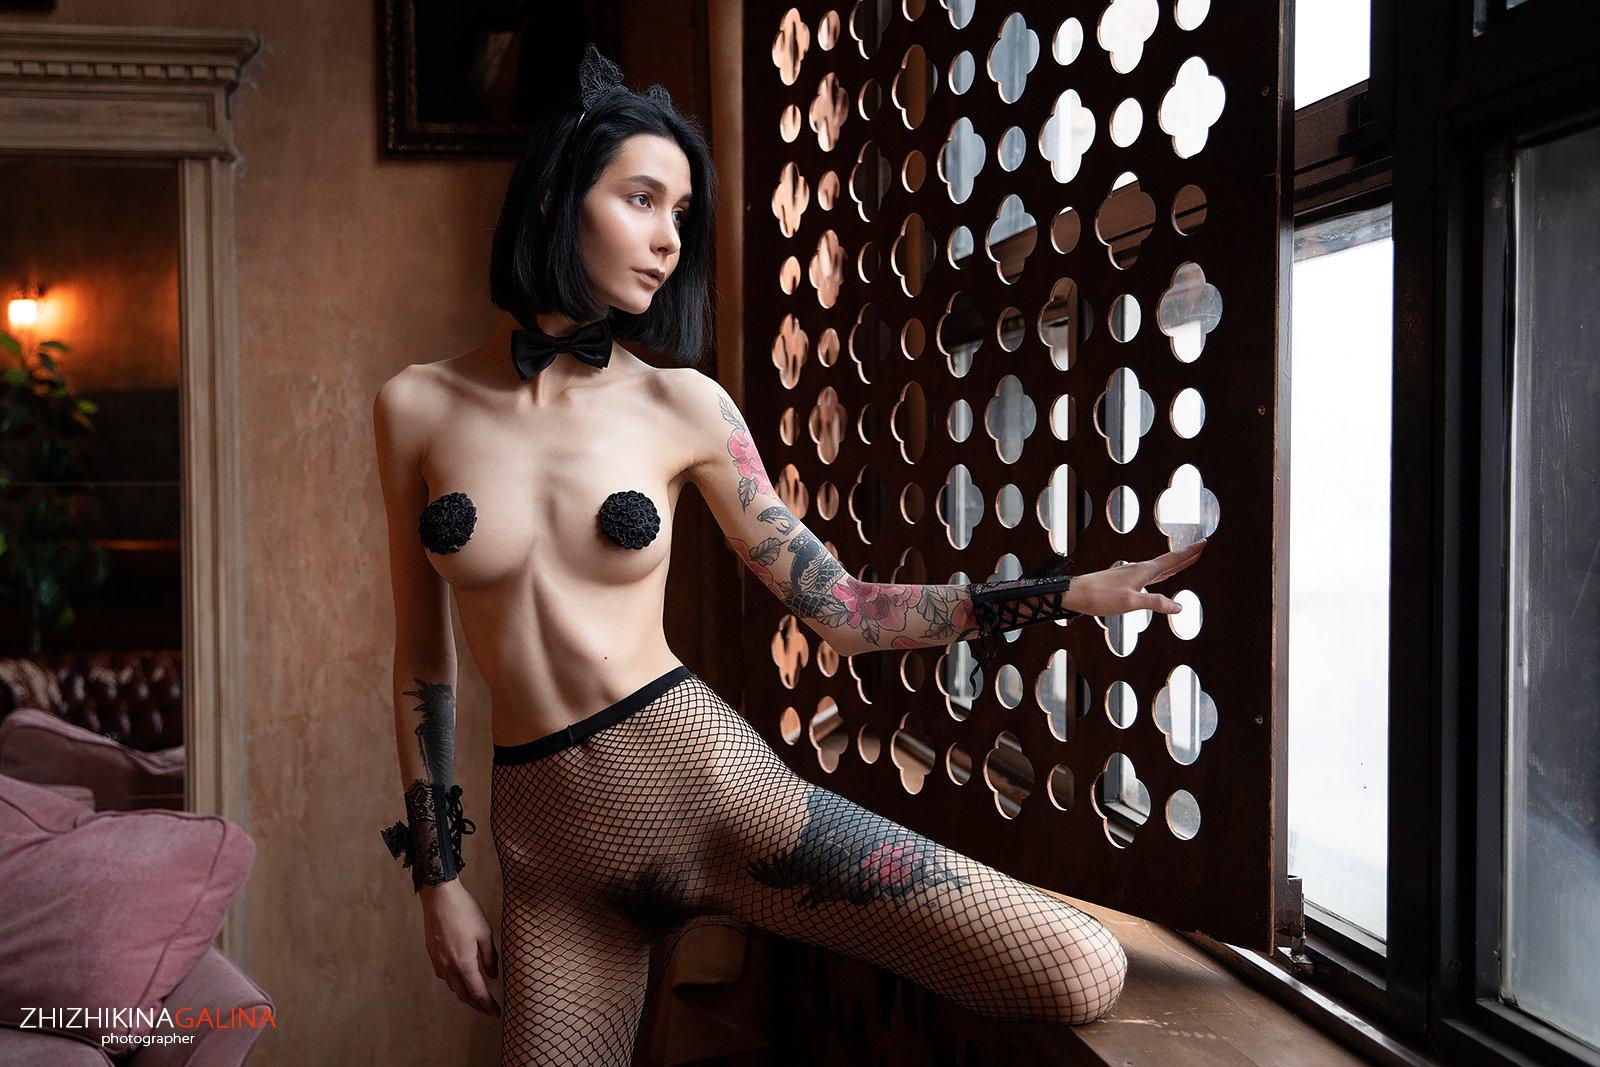 девушка, ню, артню, красивая, окно, фотограф, nu, nude, kitty, girl, portrait, кошка, Галина Жижикина